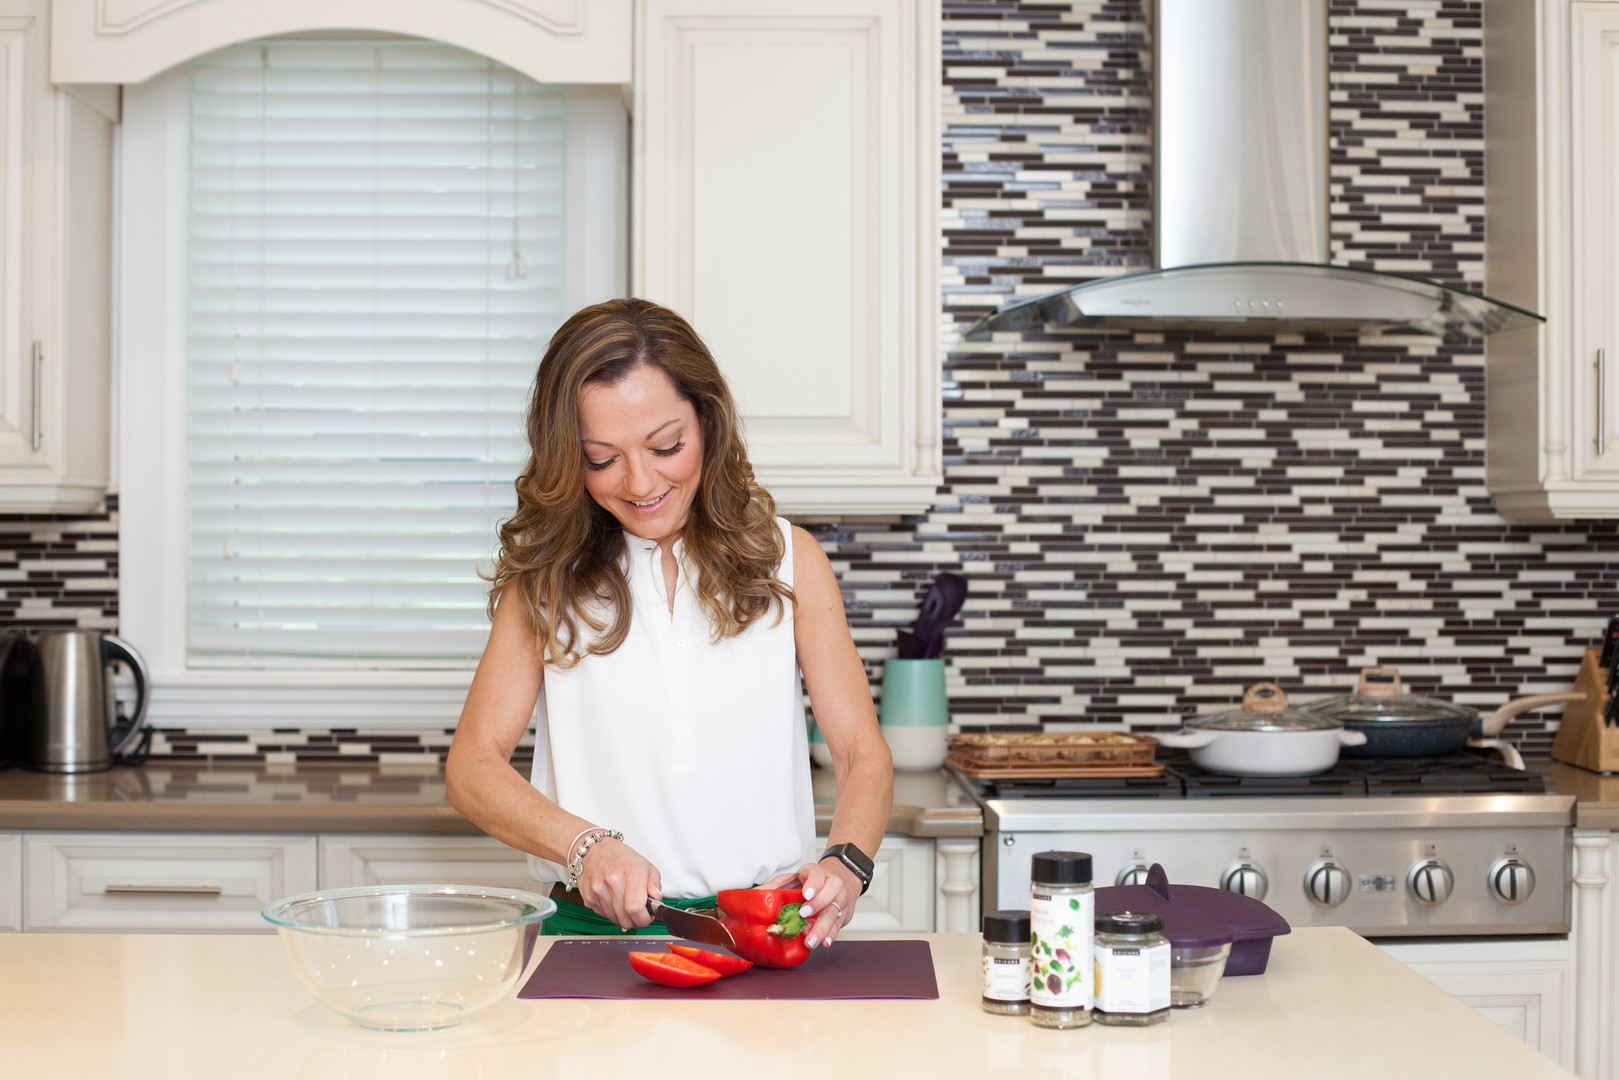 Viky Rose Influencer Blogger Entrepreneur Photoshoot - Chopping Peppers